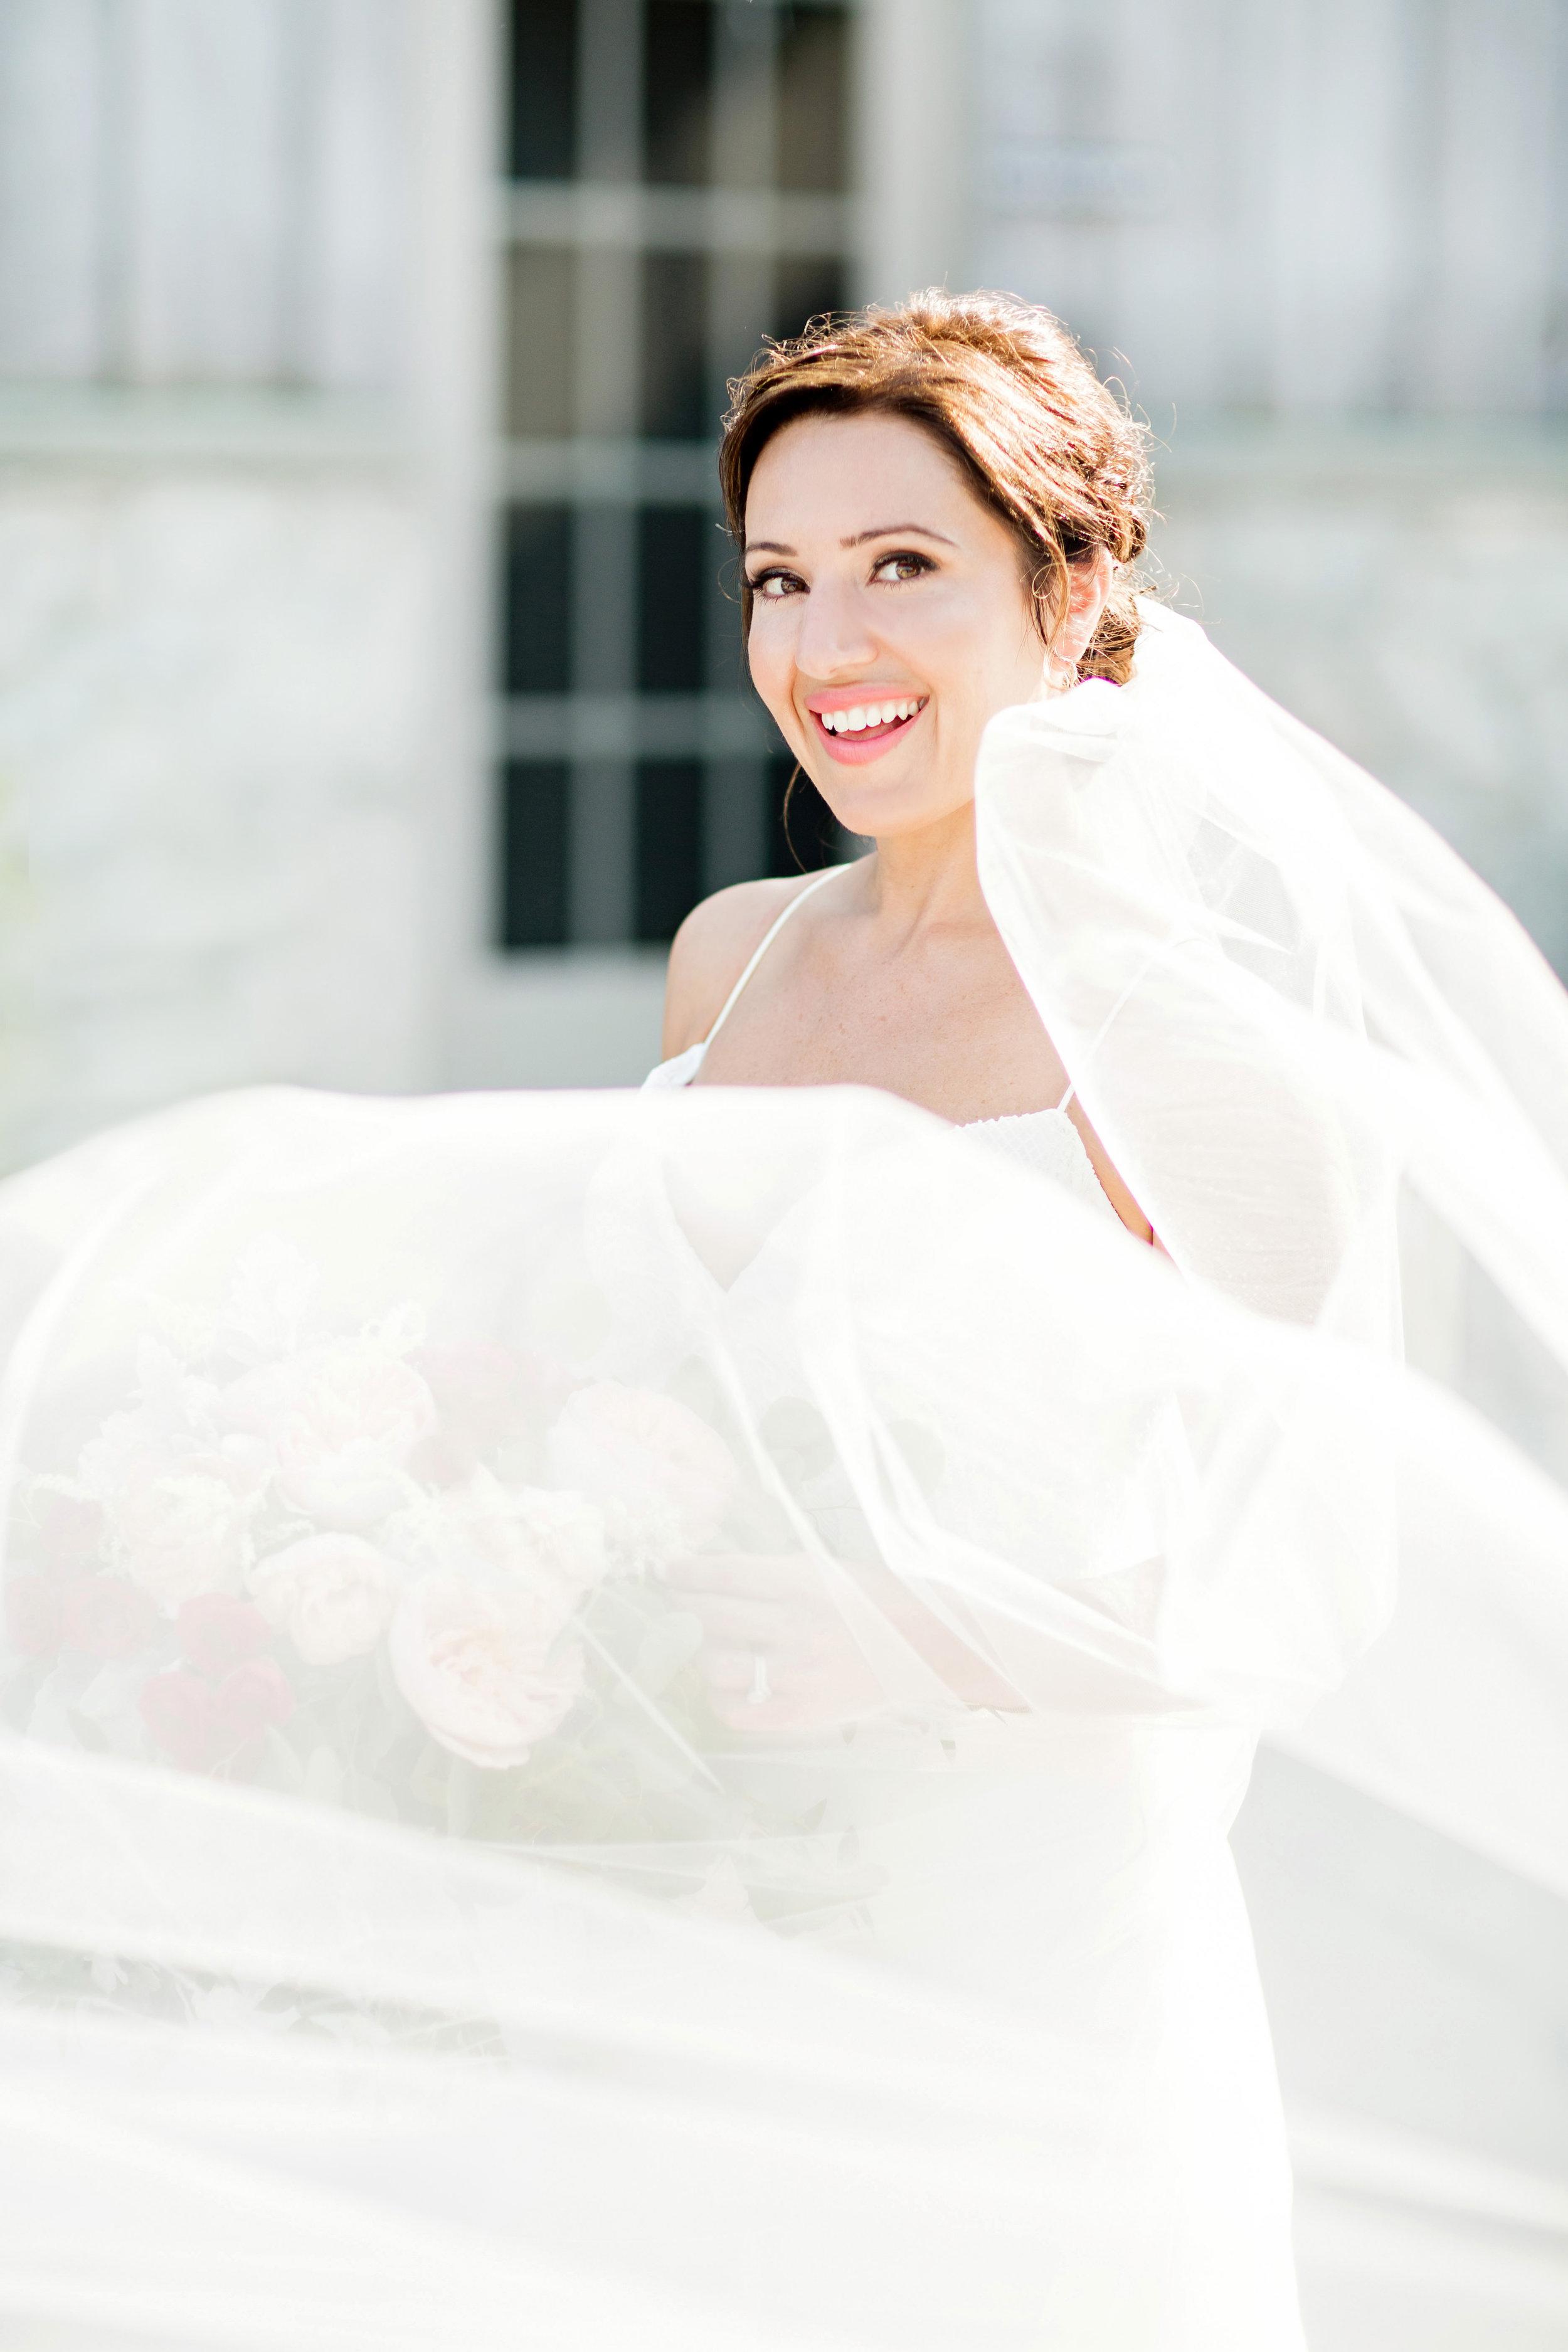 windsor-ontario-wedding-photographer-sprucewood-wintery-wedding-eryn-shea-photography-01.jpg